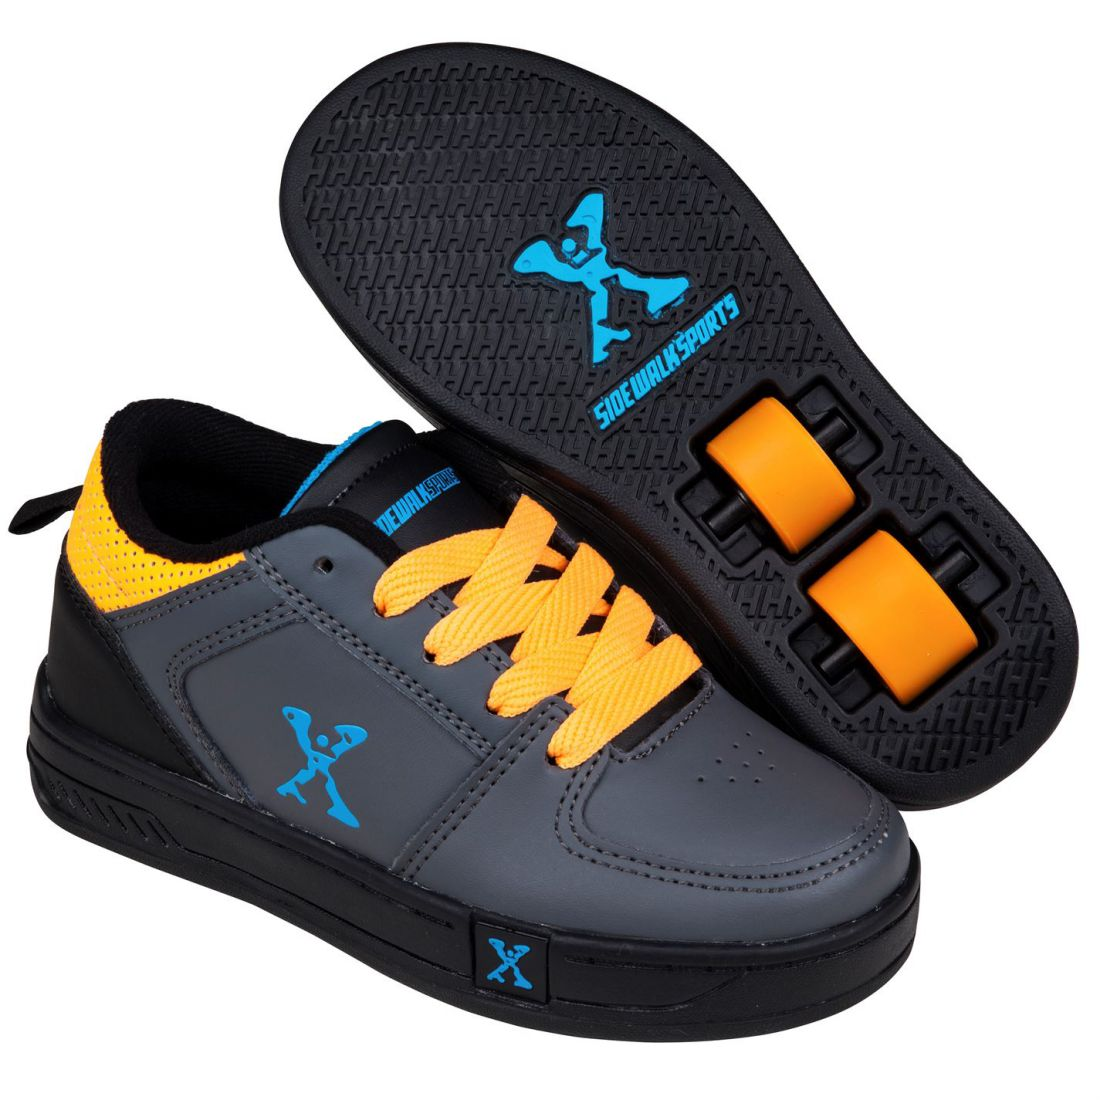 778308b38913 Sidewalk Sport Kids Street Boys Lace Up Skate Wheeled Roller Shoes ...